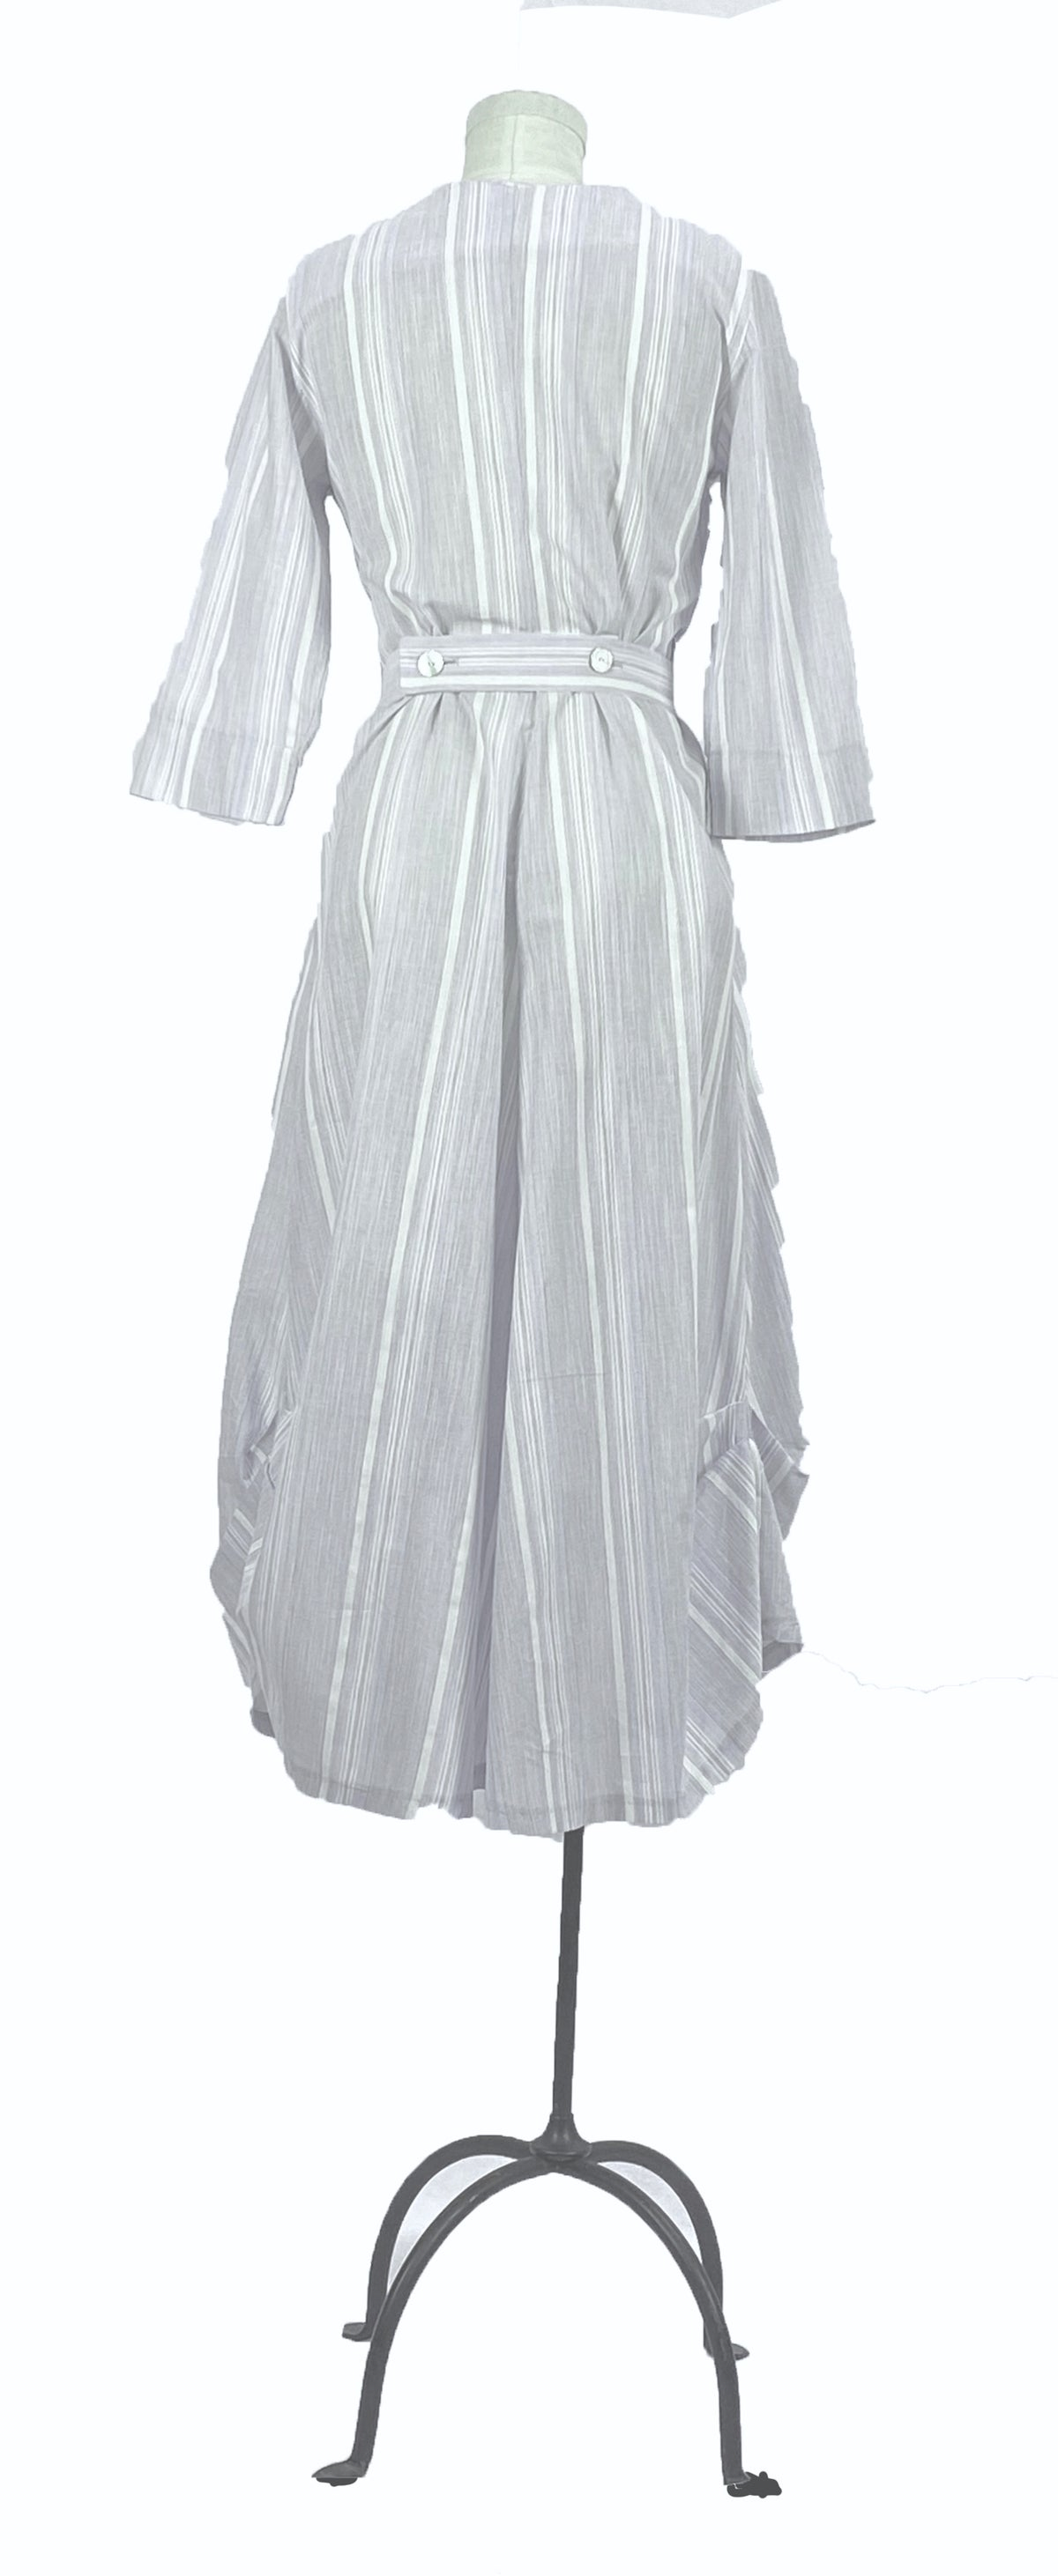 Image of artemisia dress